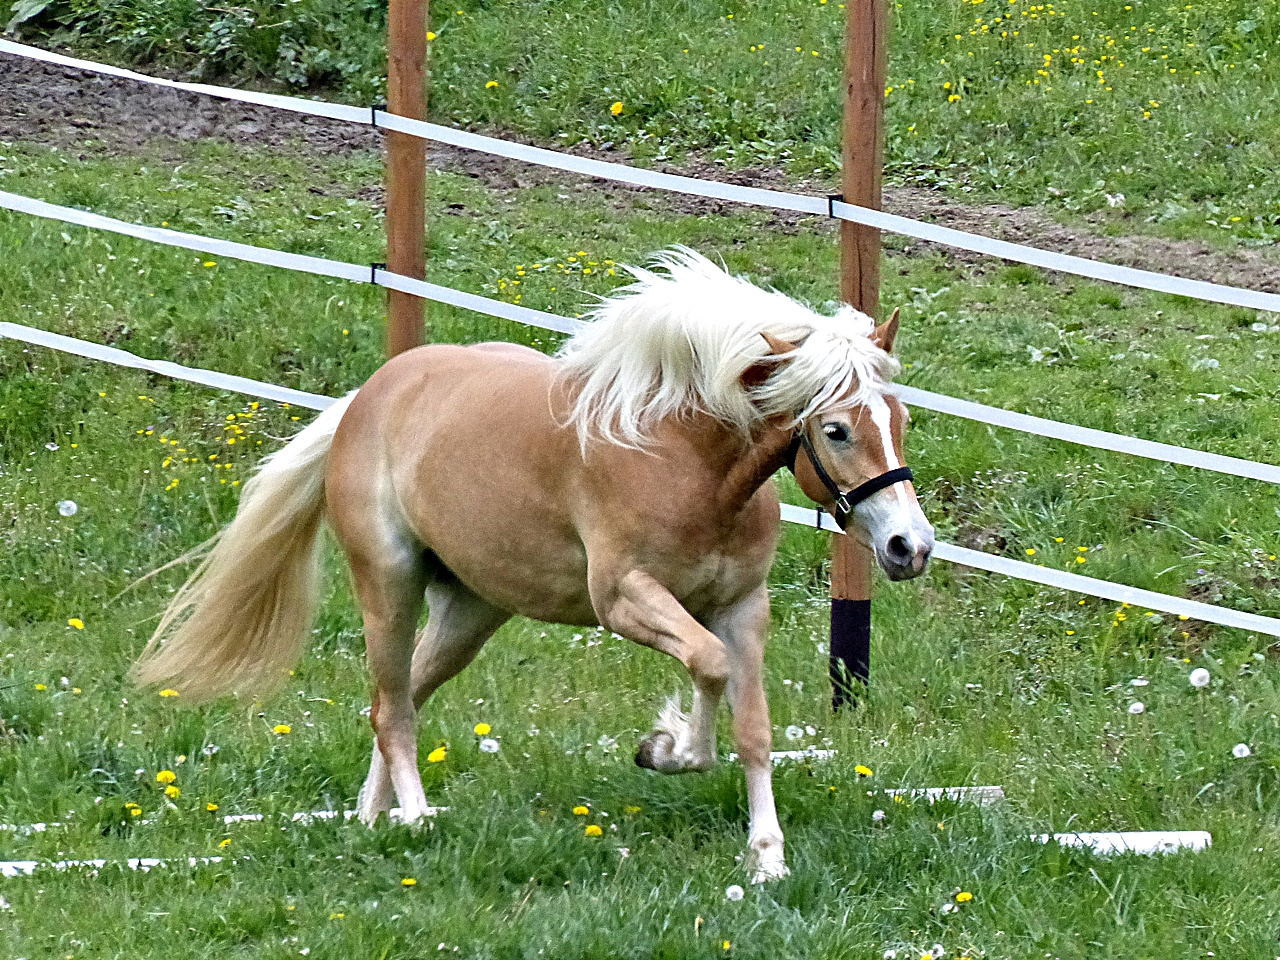 Hopp,hopp hopp Pferdchen lauf Galopp